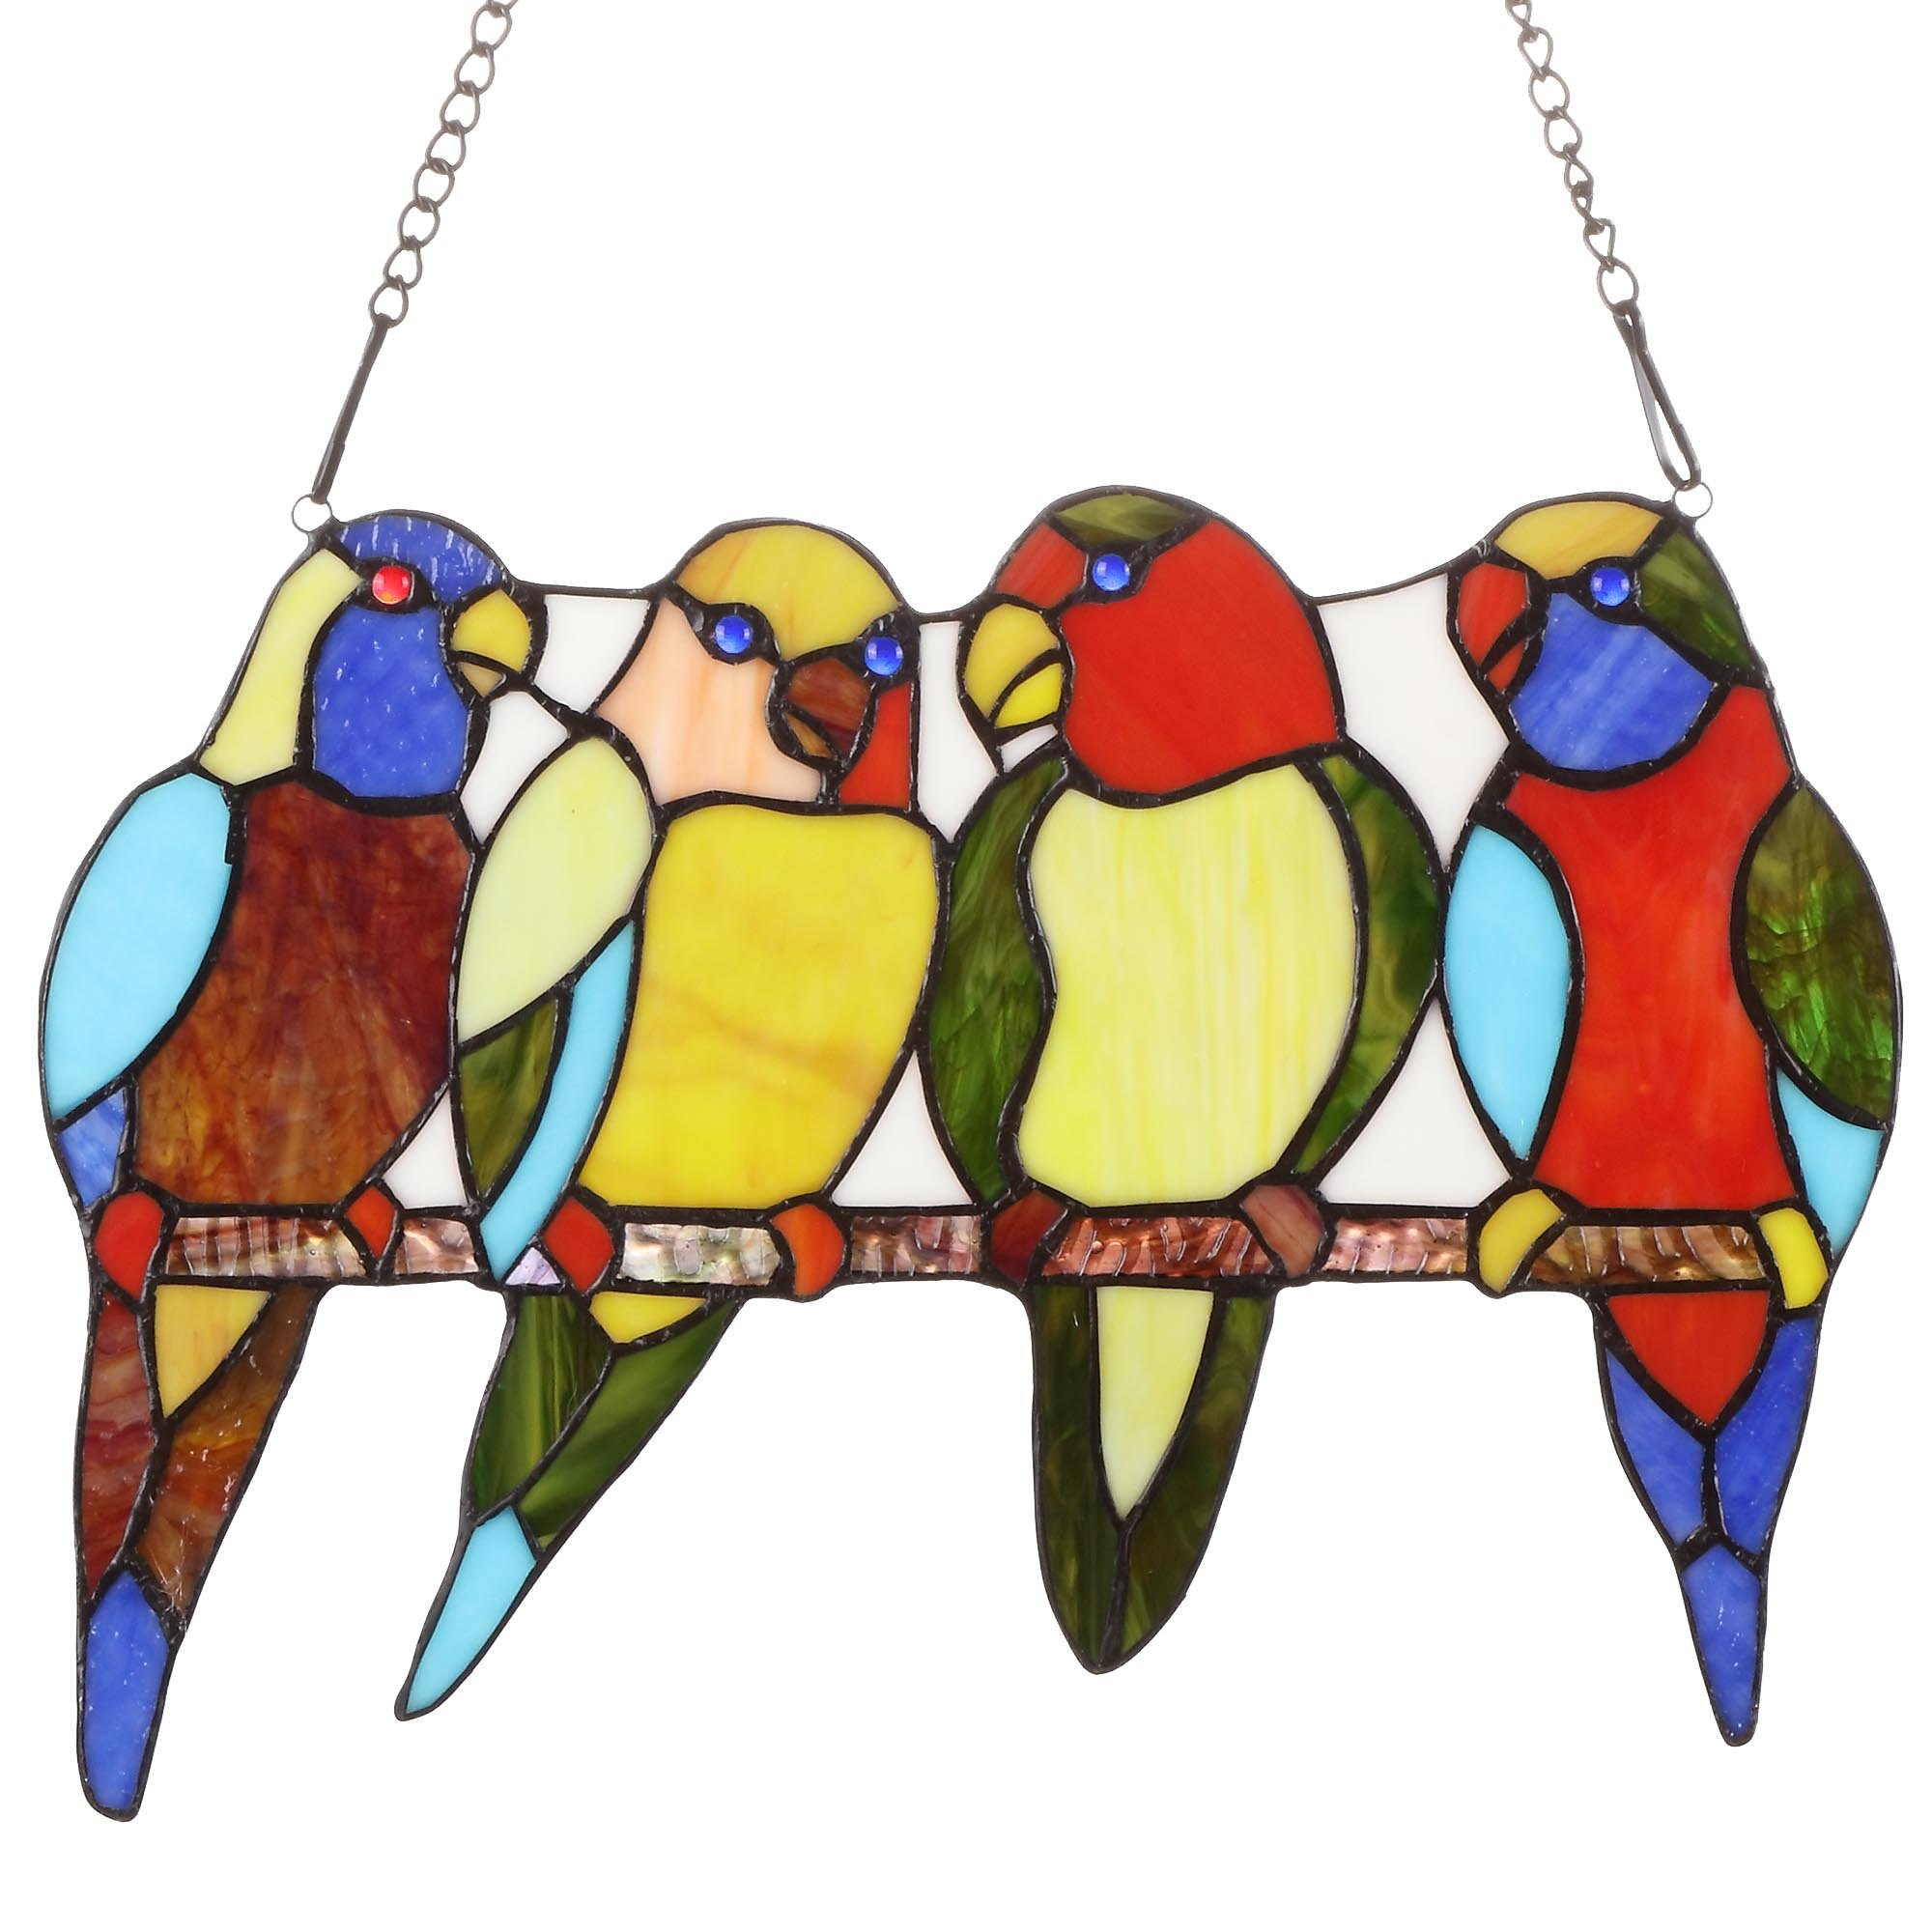 Bieye W10001 Tropical Birds Tiffany Style Stained Glass Window Panel with Hanging Chain, 14.5-inch Wide (4 Birds)